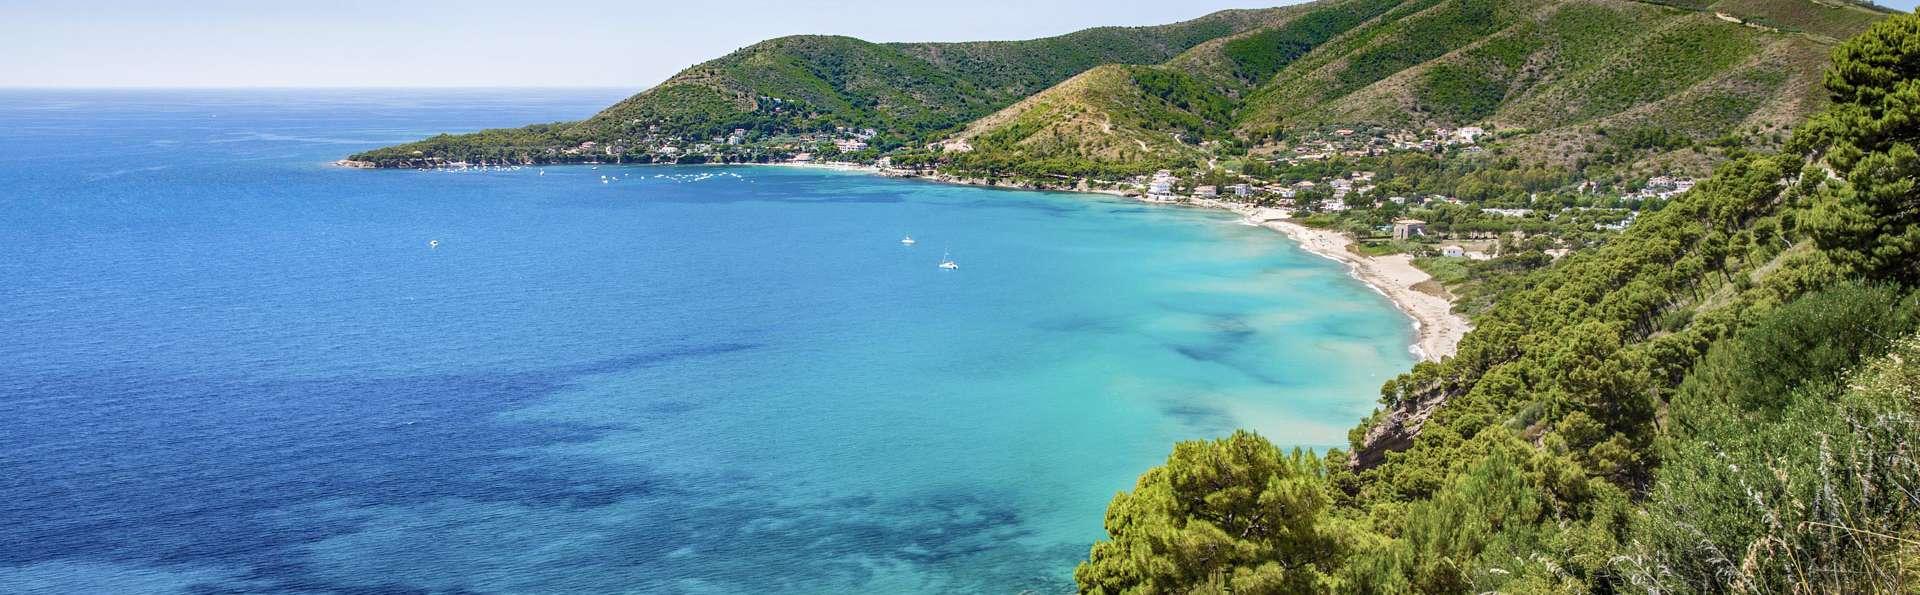 Vignadonica Resort - EDIT_SALERNO_03.jpg